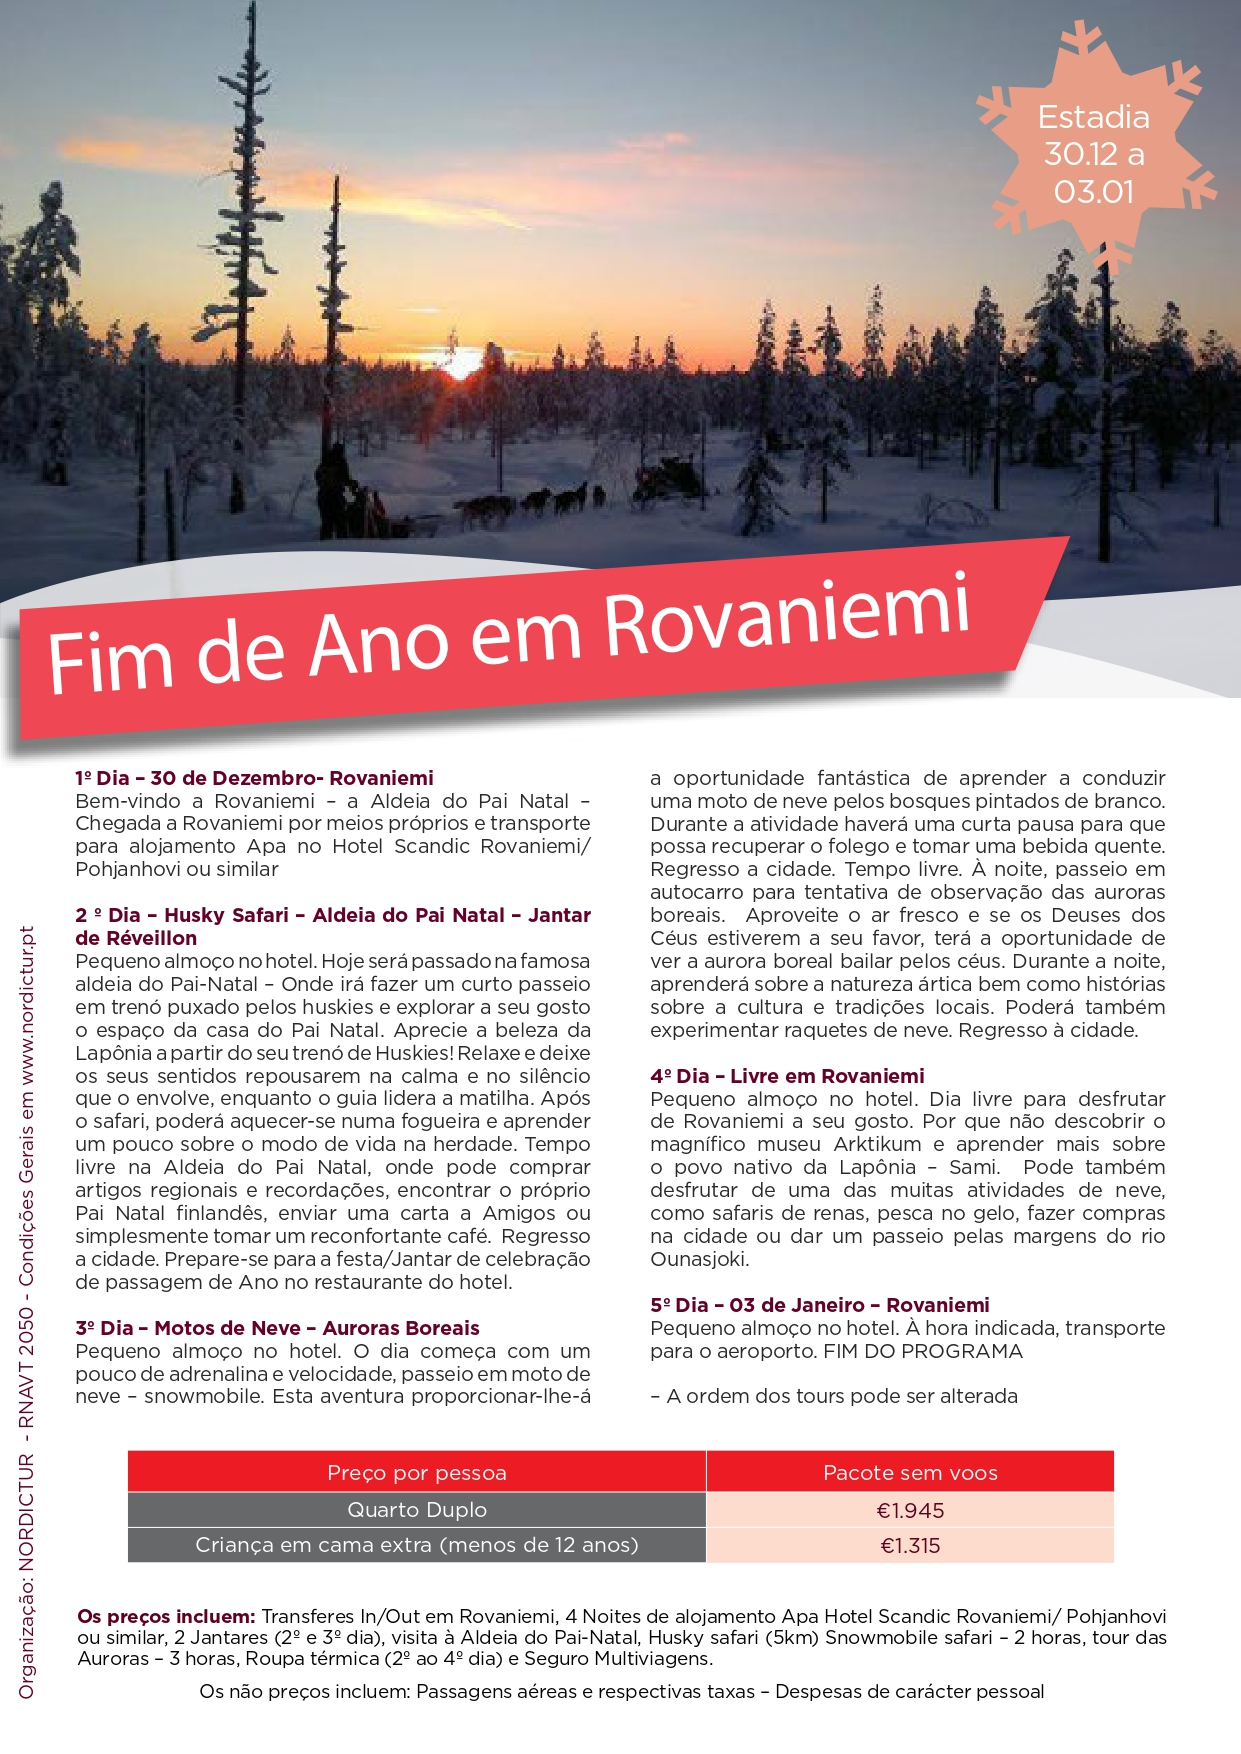 Fim-de-ano-em-Rovaniemi_page-0001